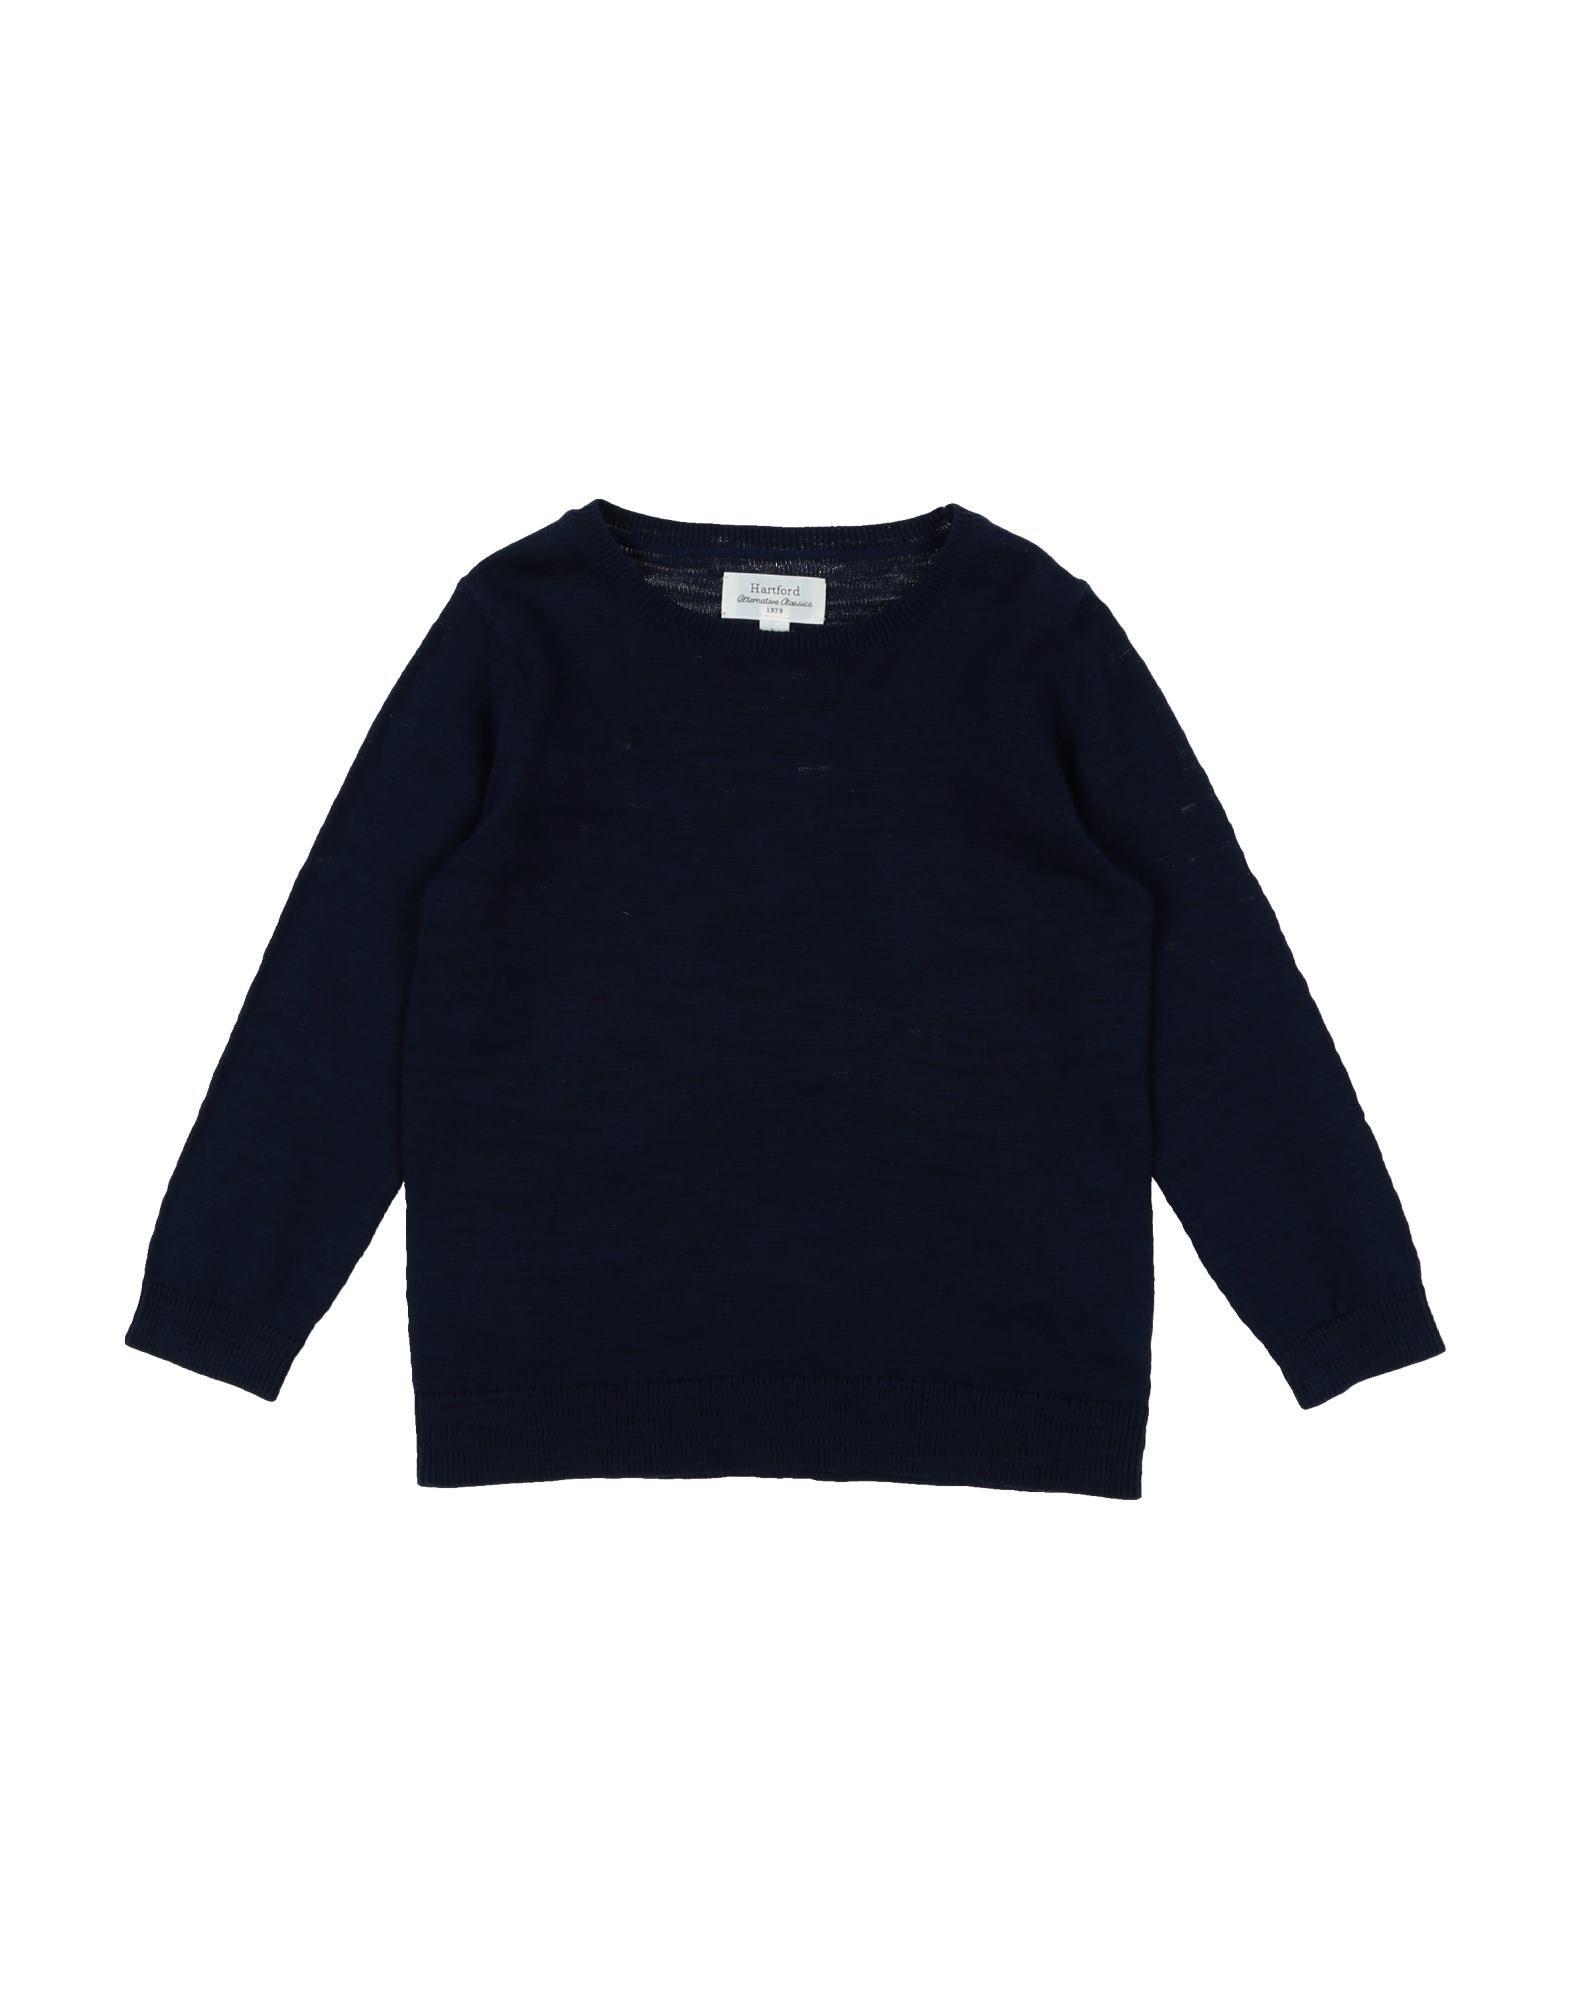 HARTFORD Sweaters - Item 39962218